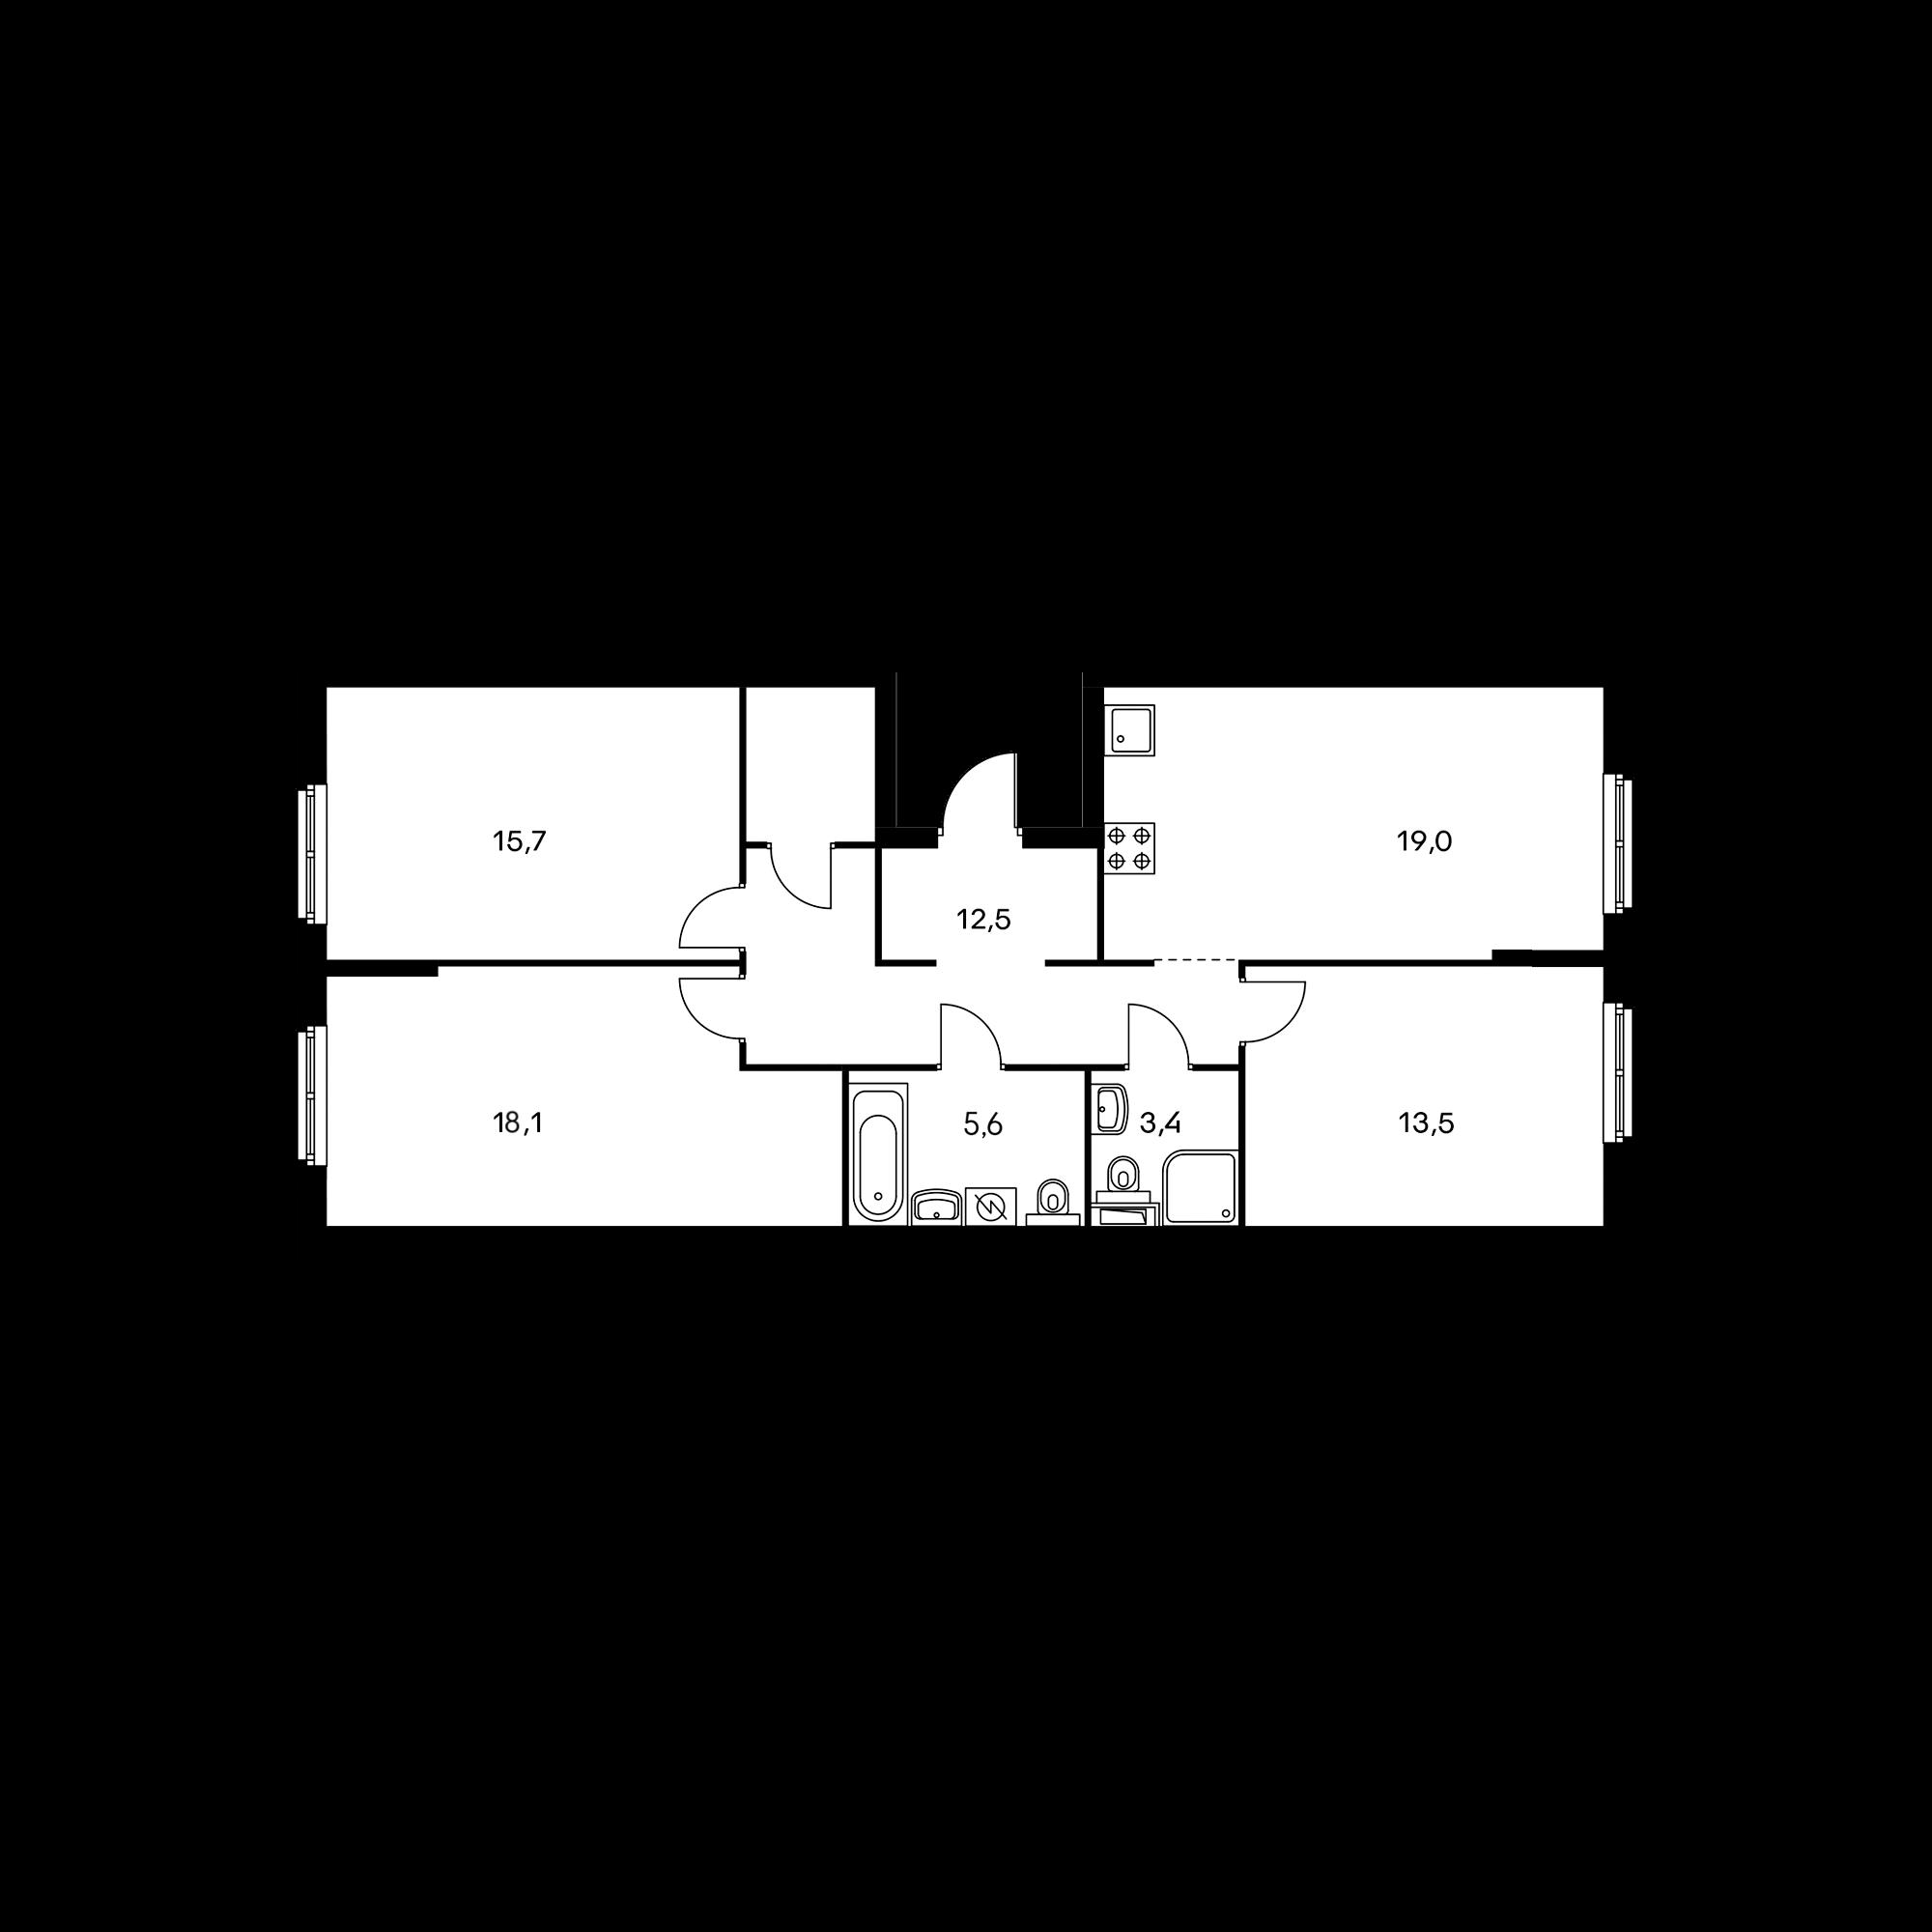 3EL5_6.6-1